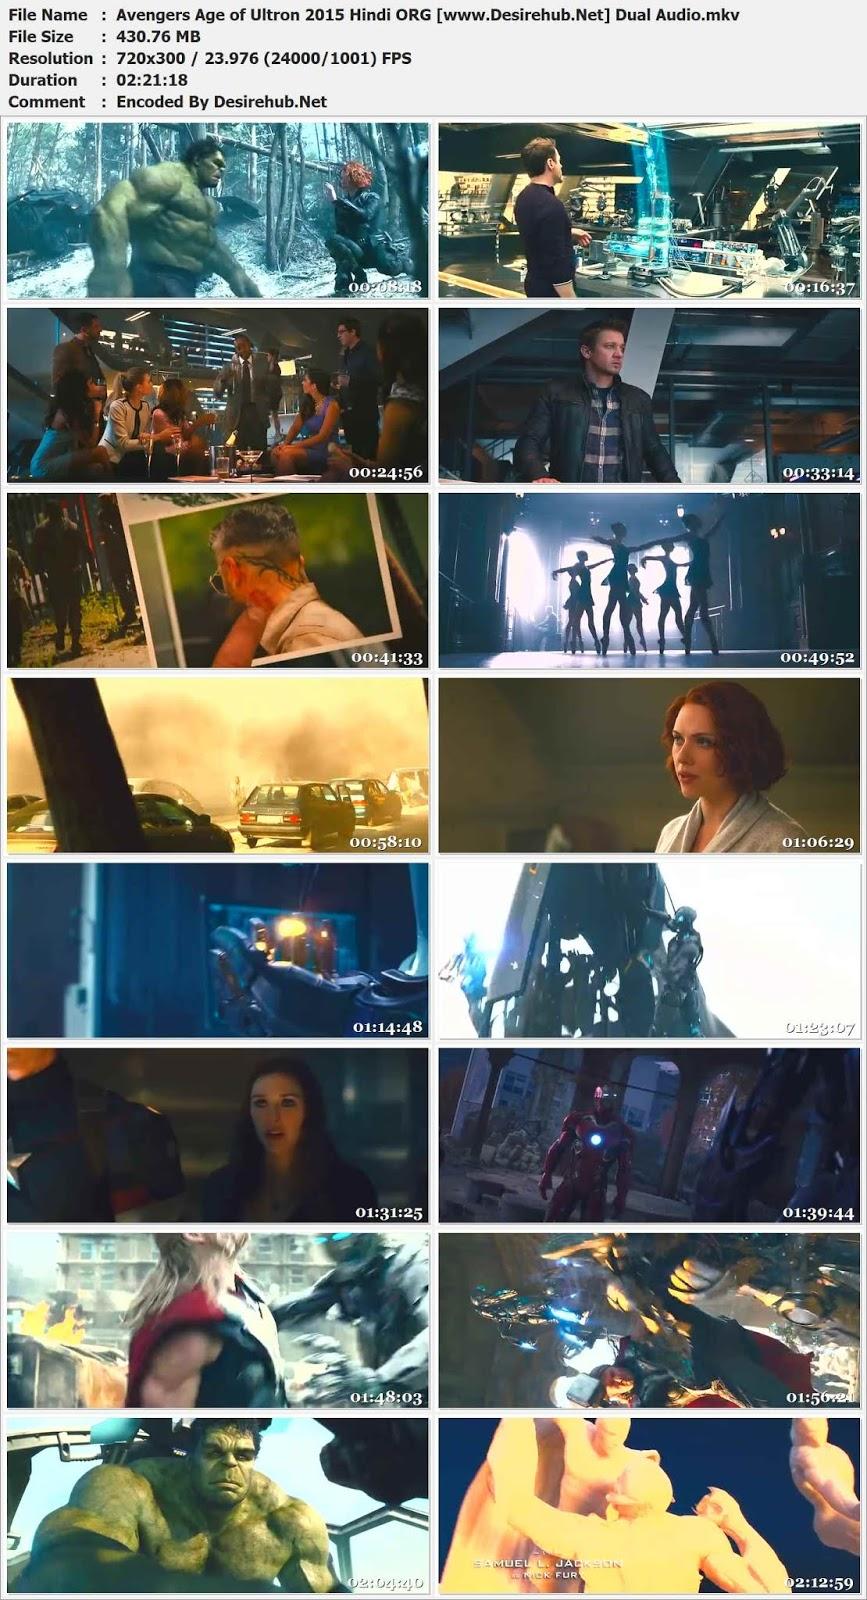 Avengers Age Of Ultron (2015) 480p Bluray Dual Audio Hindi 400MB Desirehub